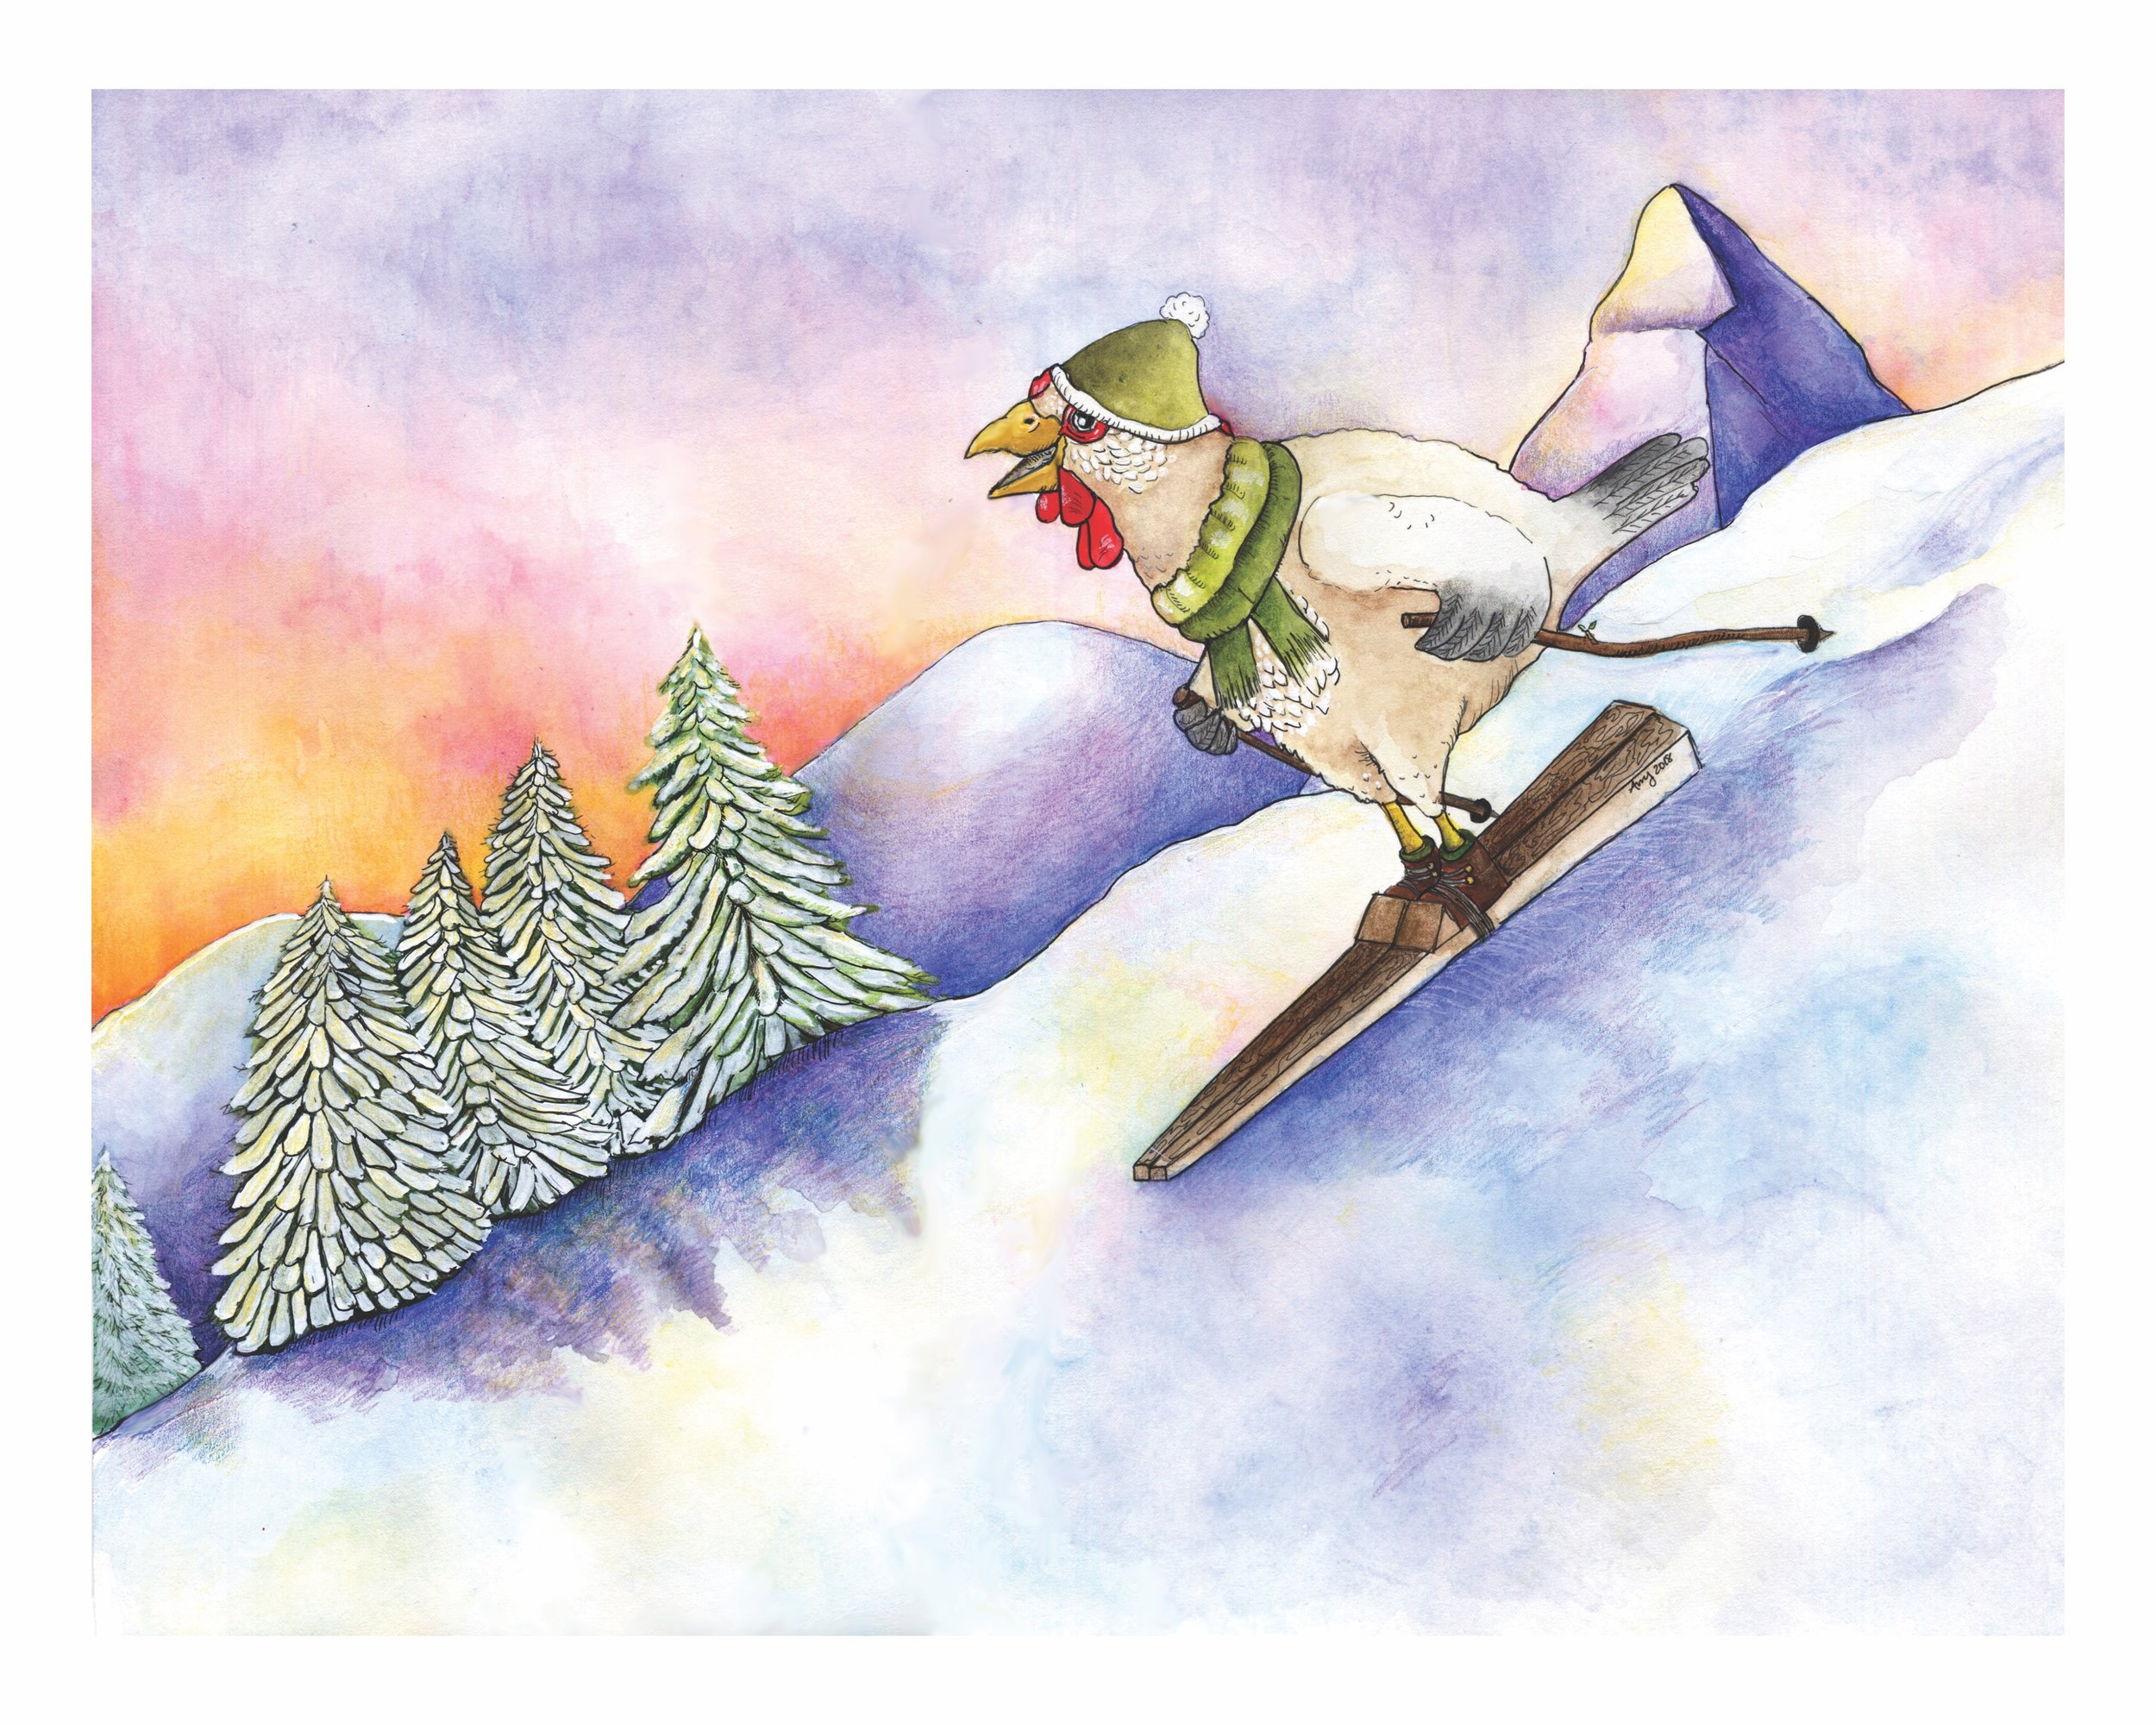 Tanya Skis down Matterhorn